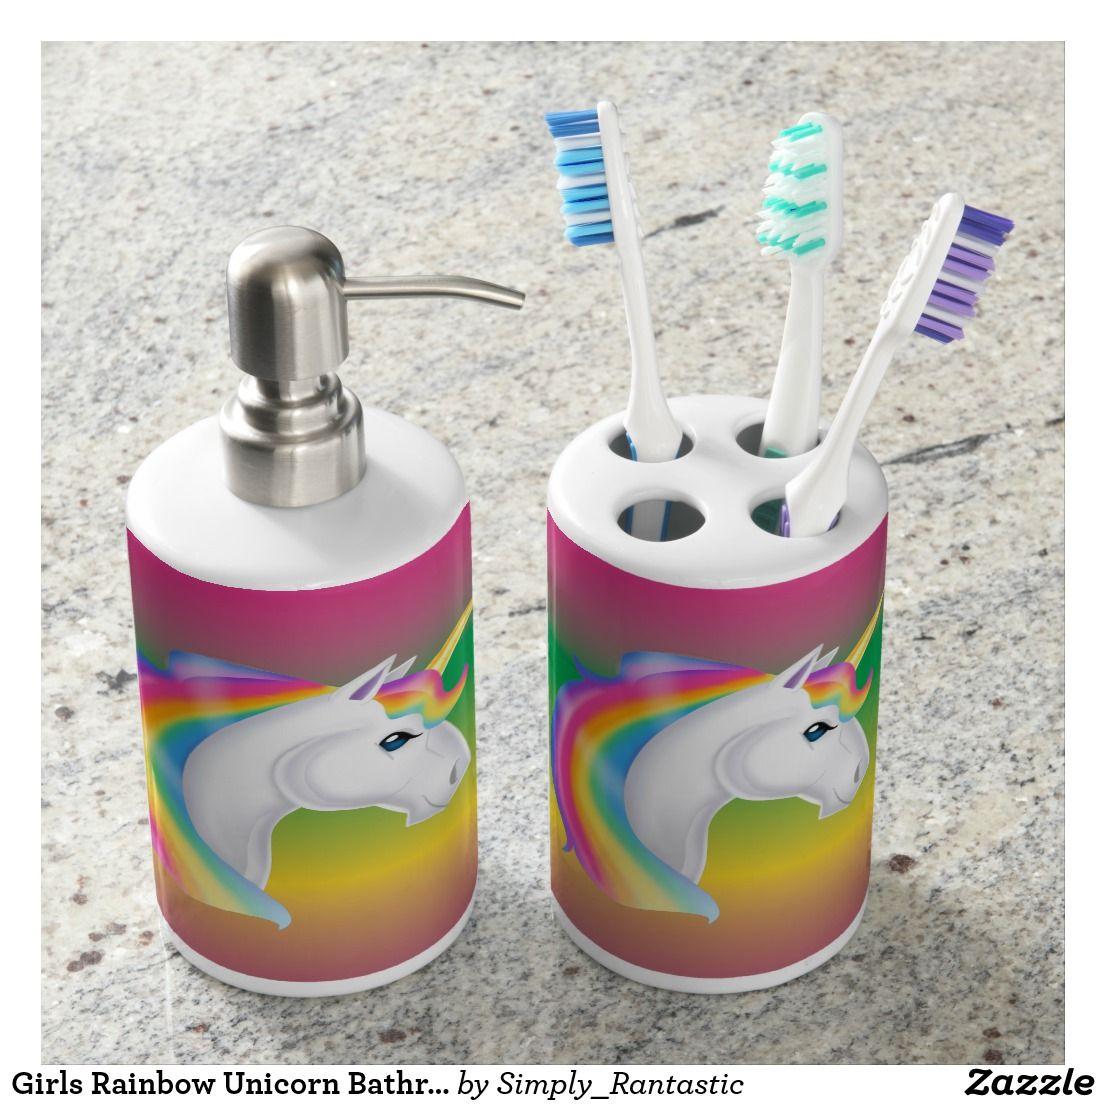 Girls Rainbow Unicorn Bathroom Set  Zazzle.com  Bath accessories